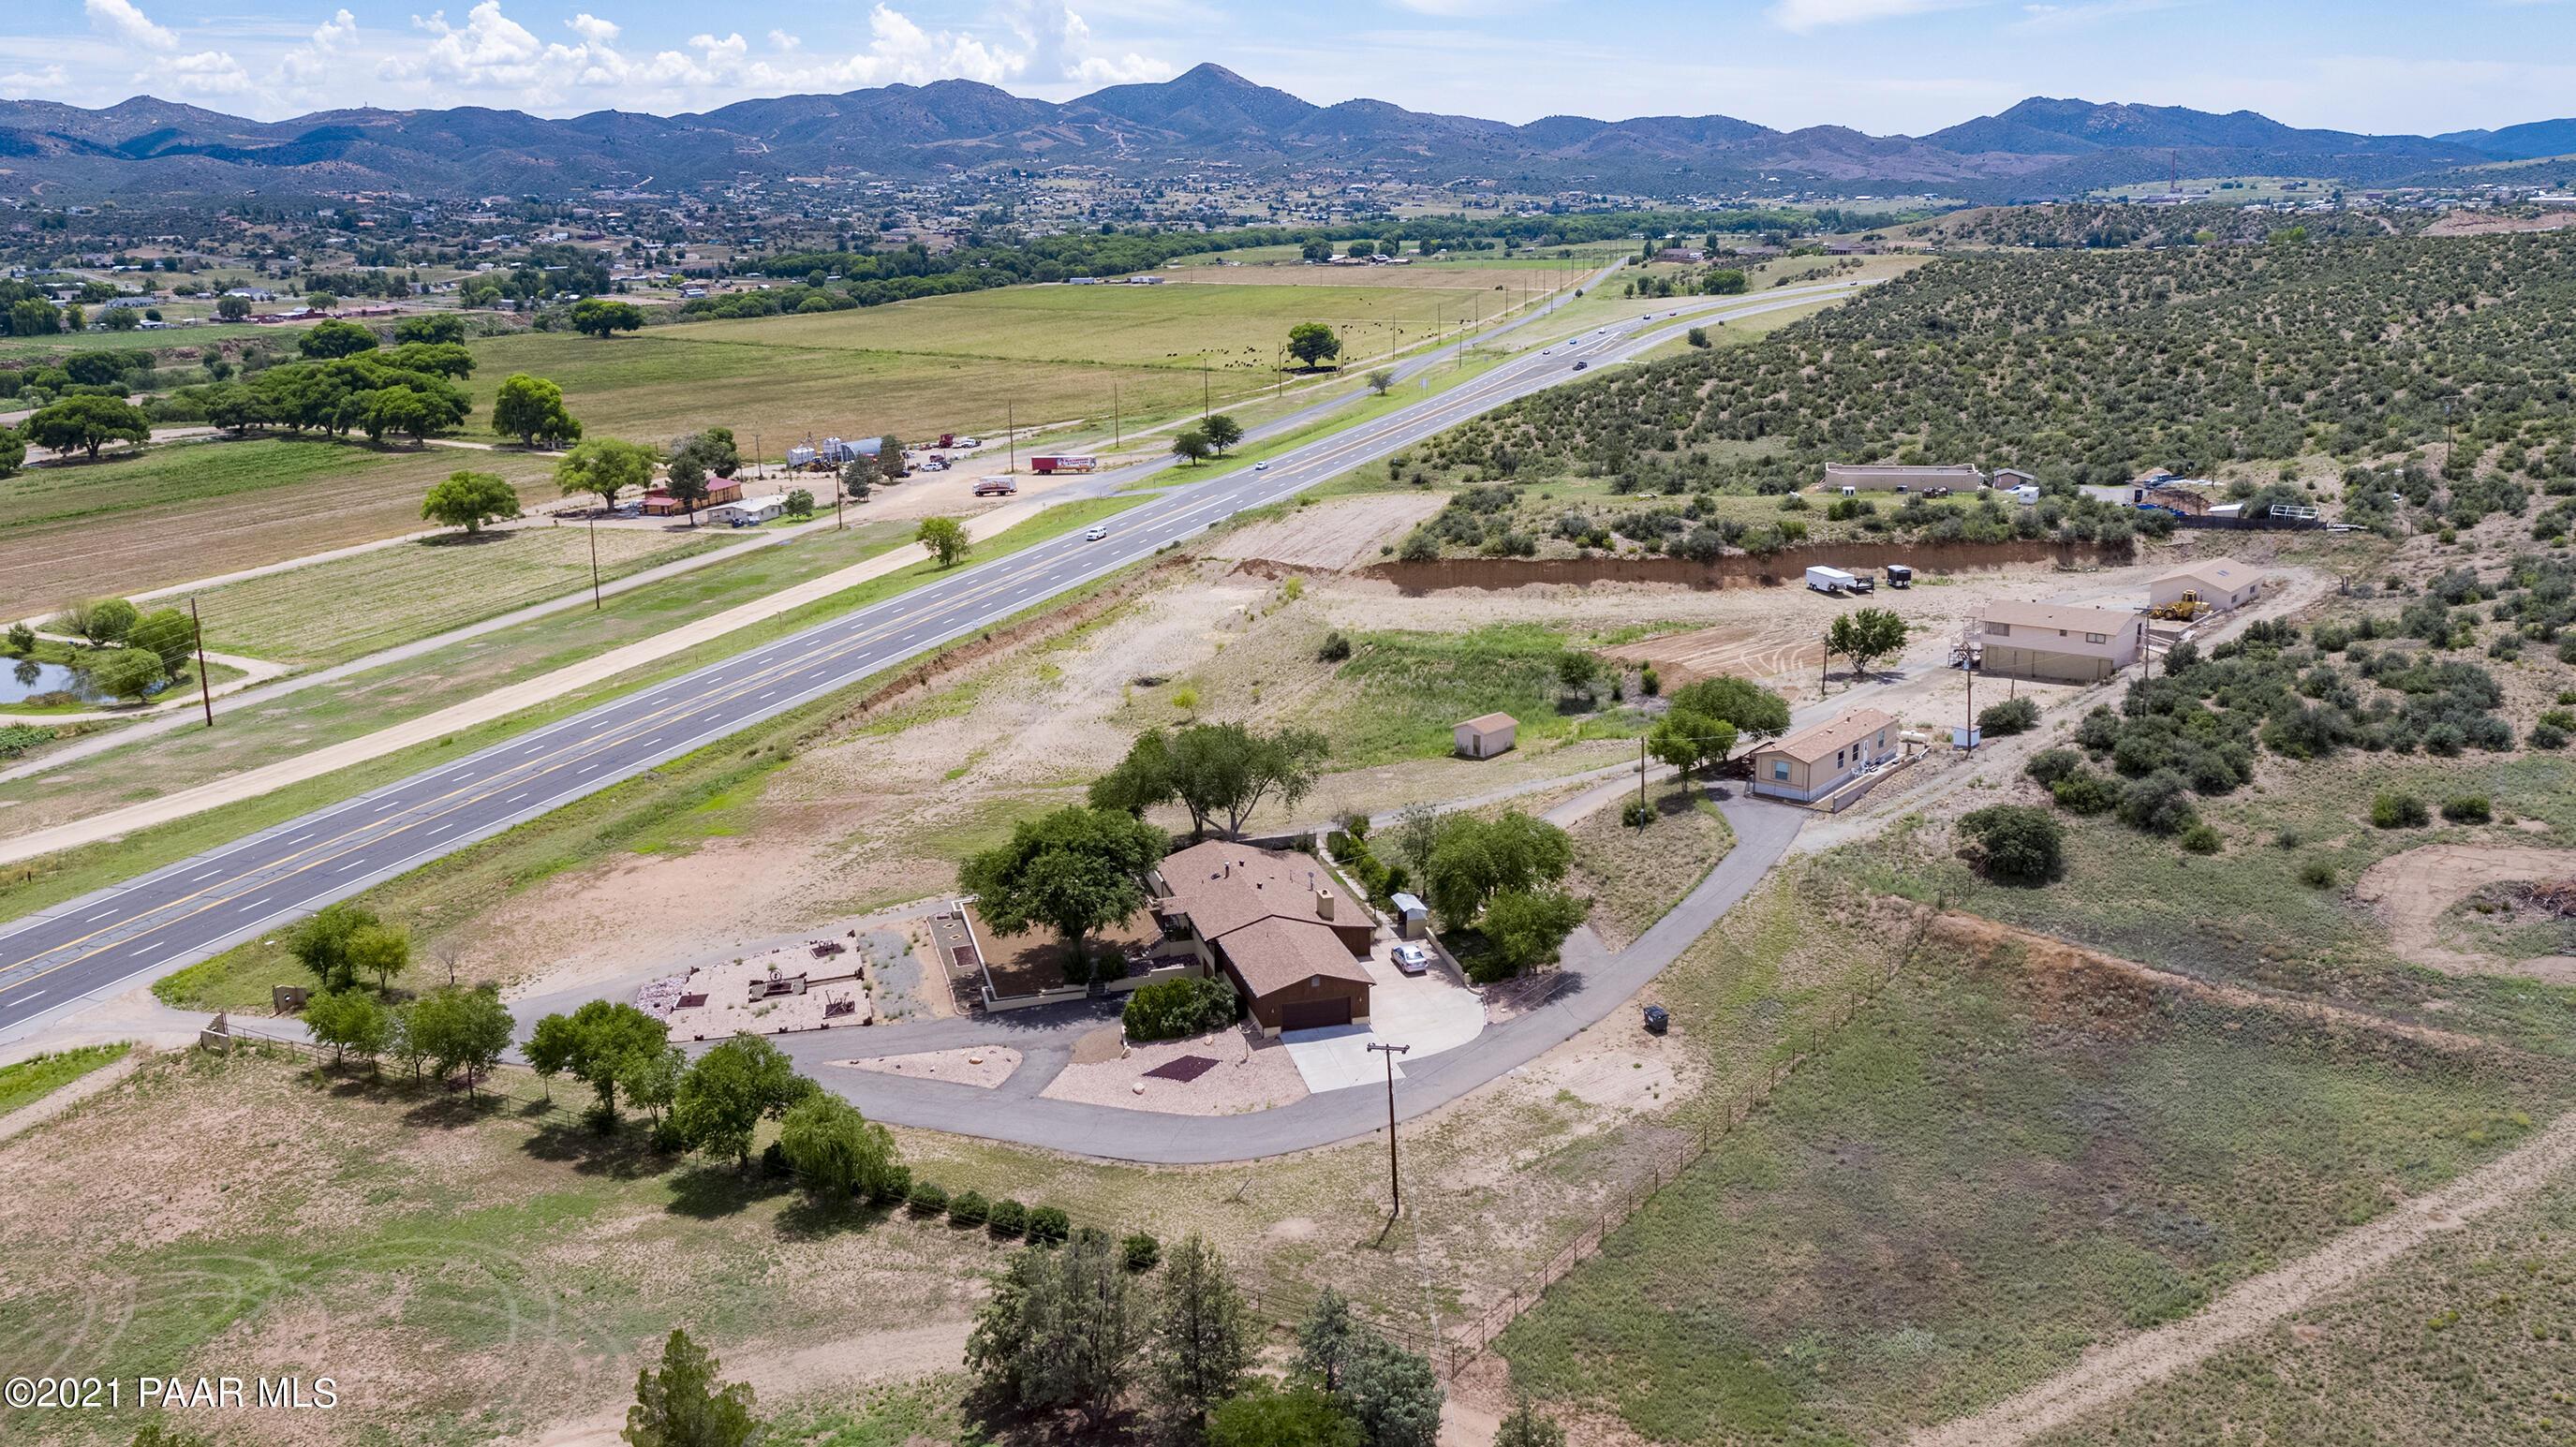 Photo of 1084 State Route 69, Dewey-Humboldt, AZ 86327